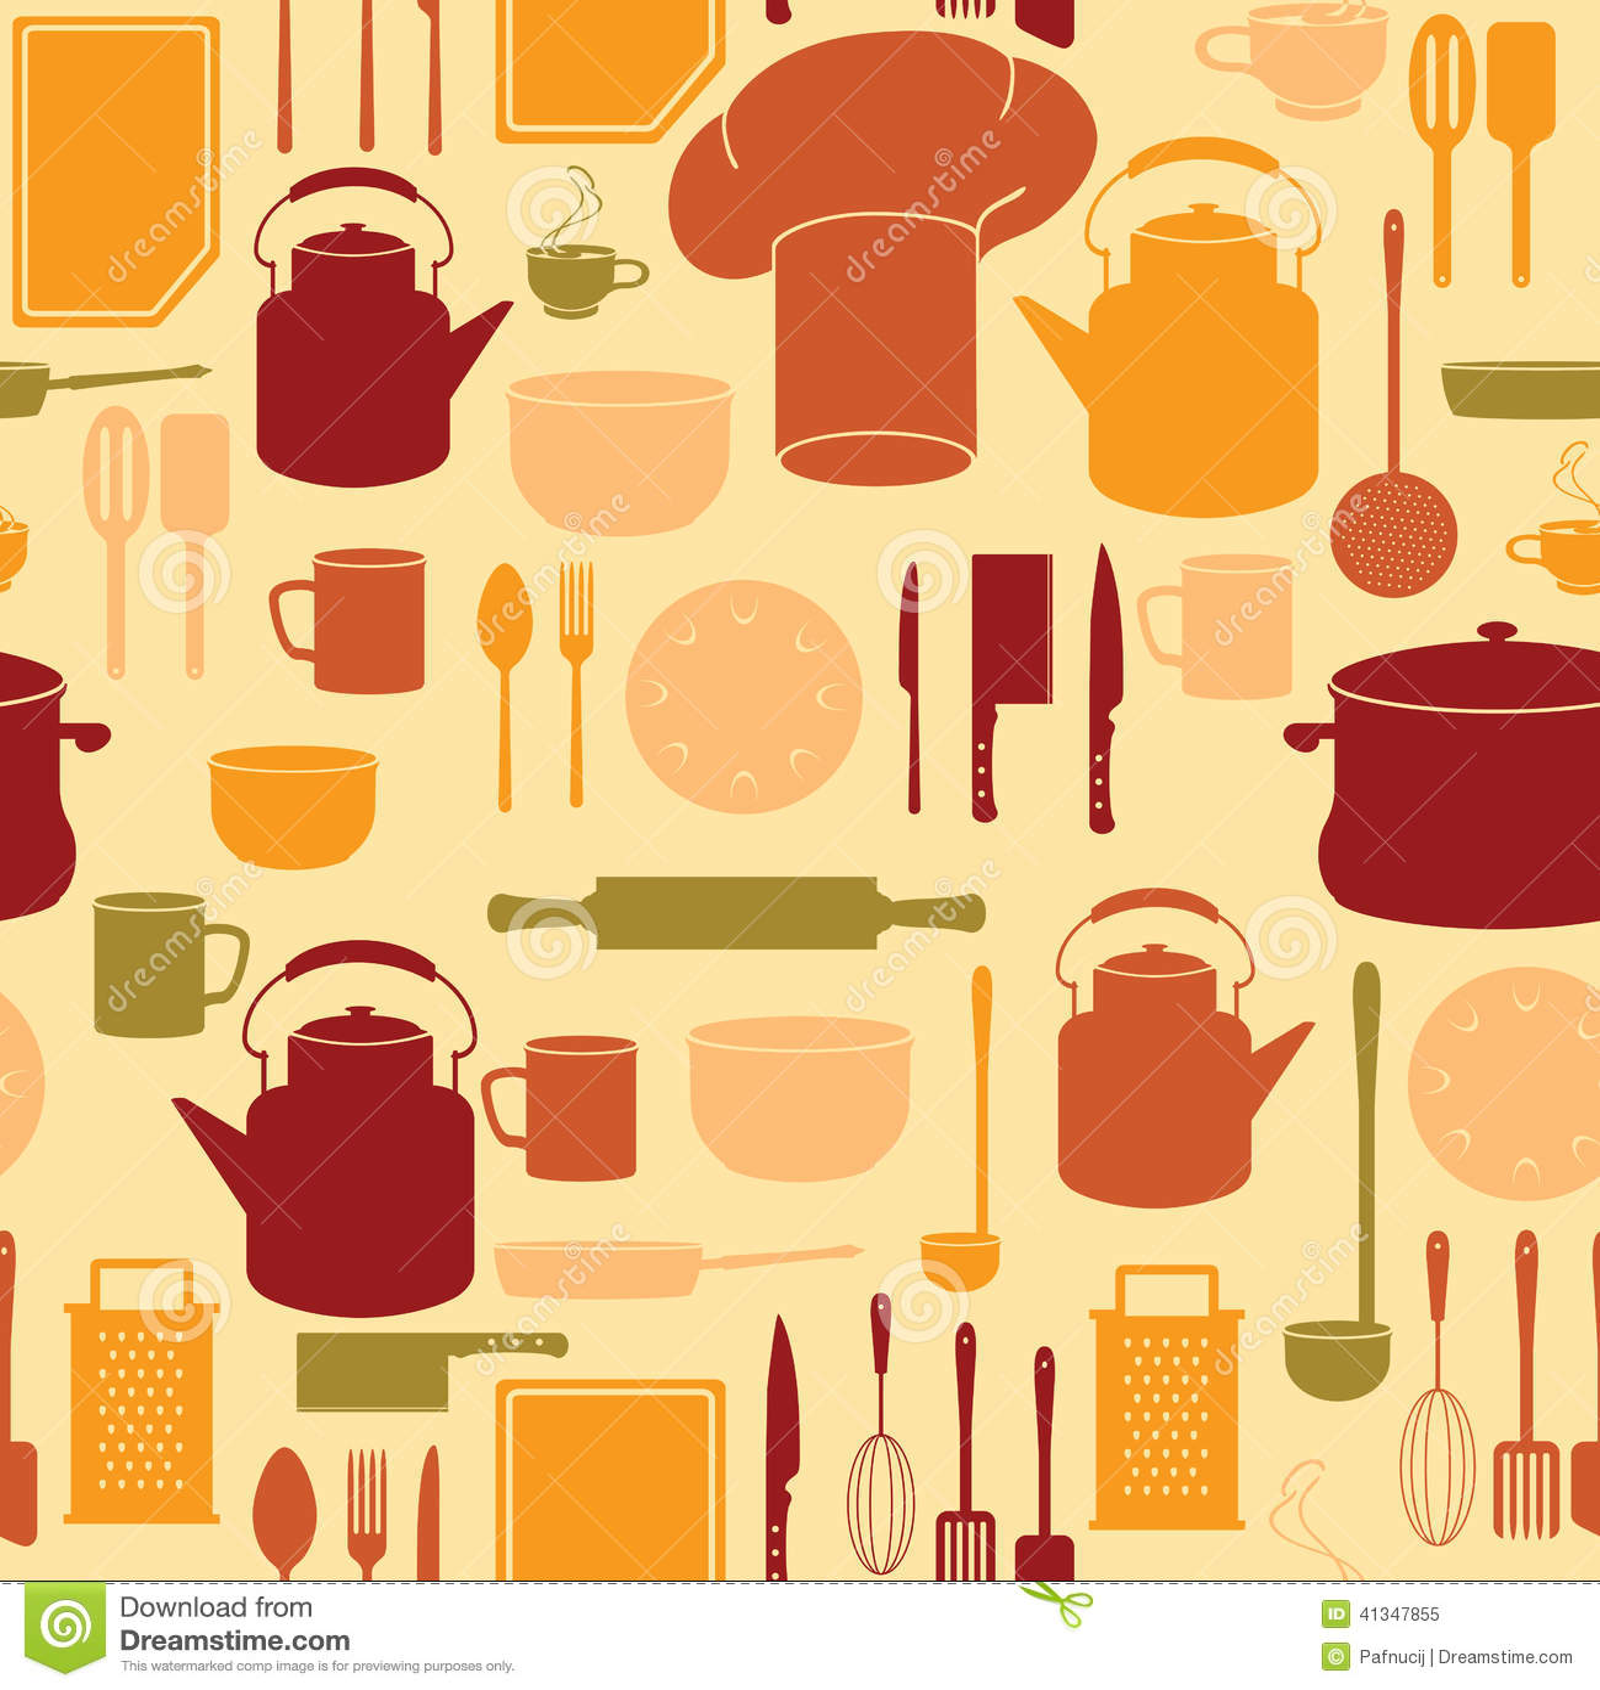 Painting Kitchen Utensils